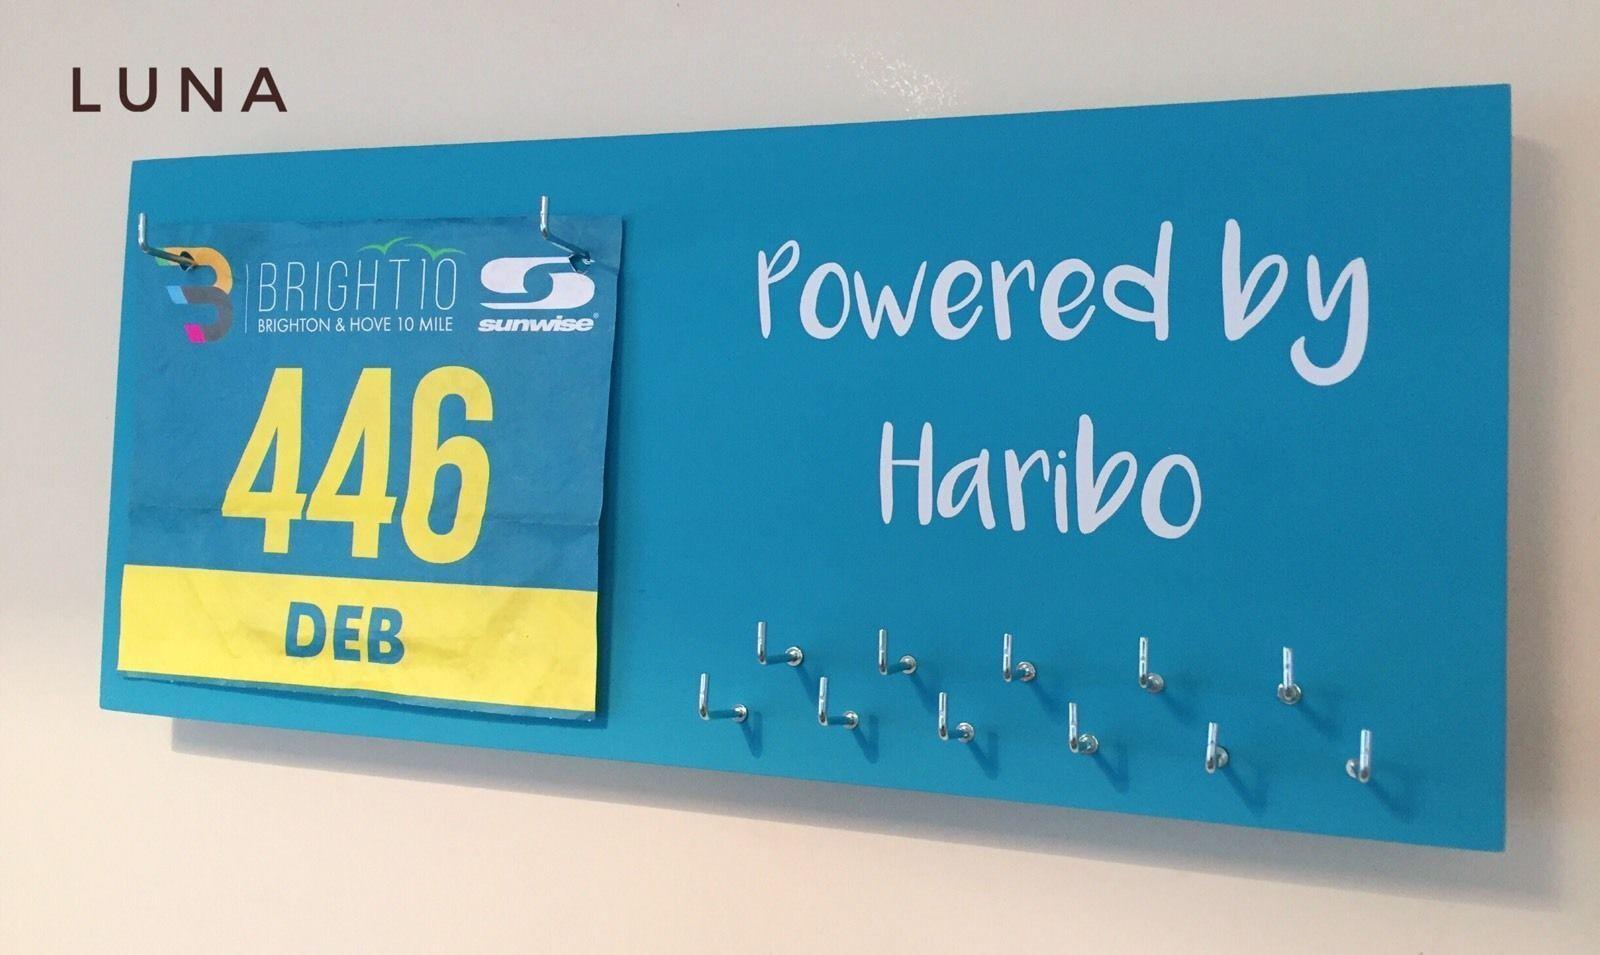 Powered by Haribo  - Runner   Sports Medal & Bib hanger   holder  display